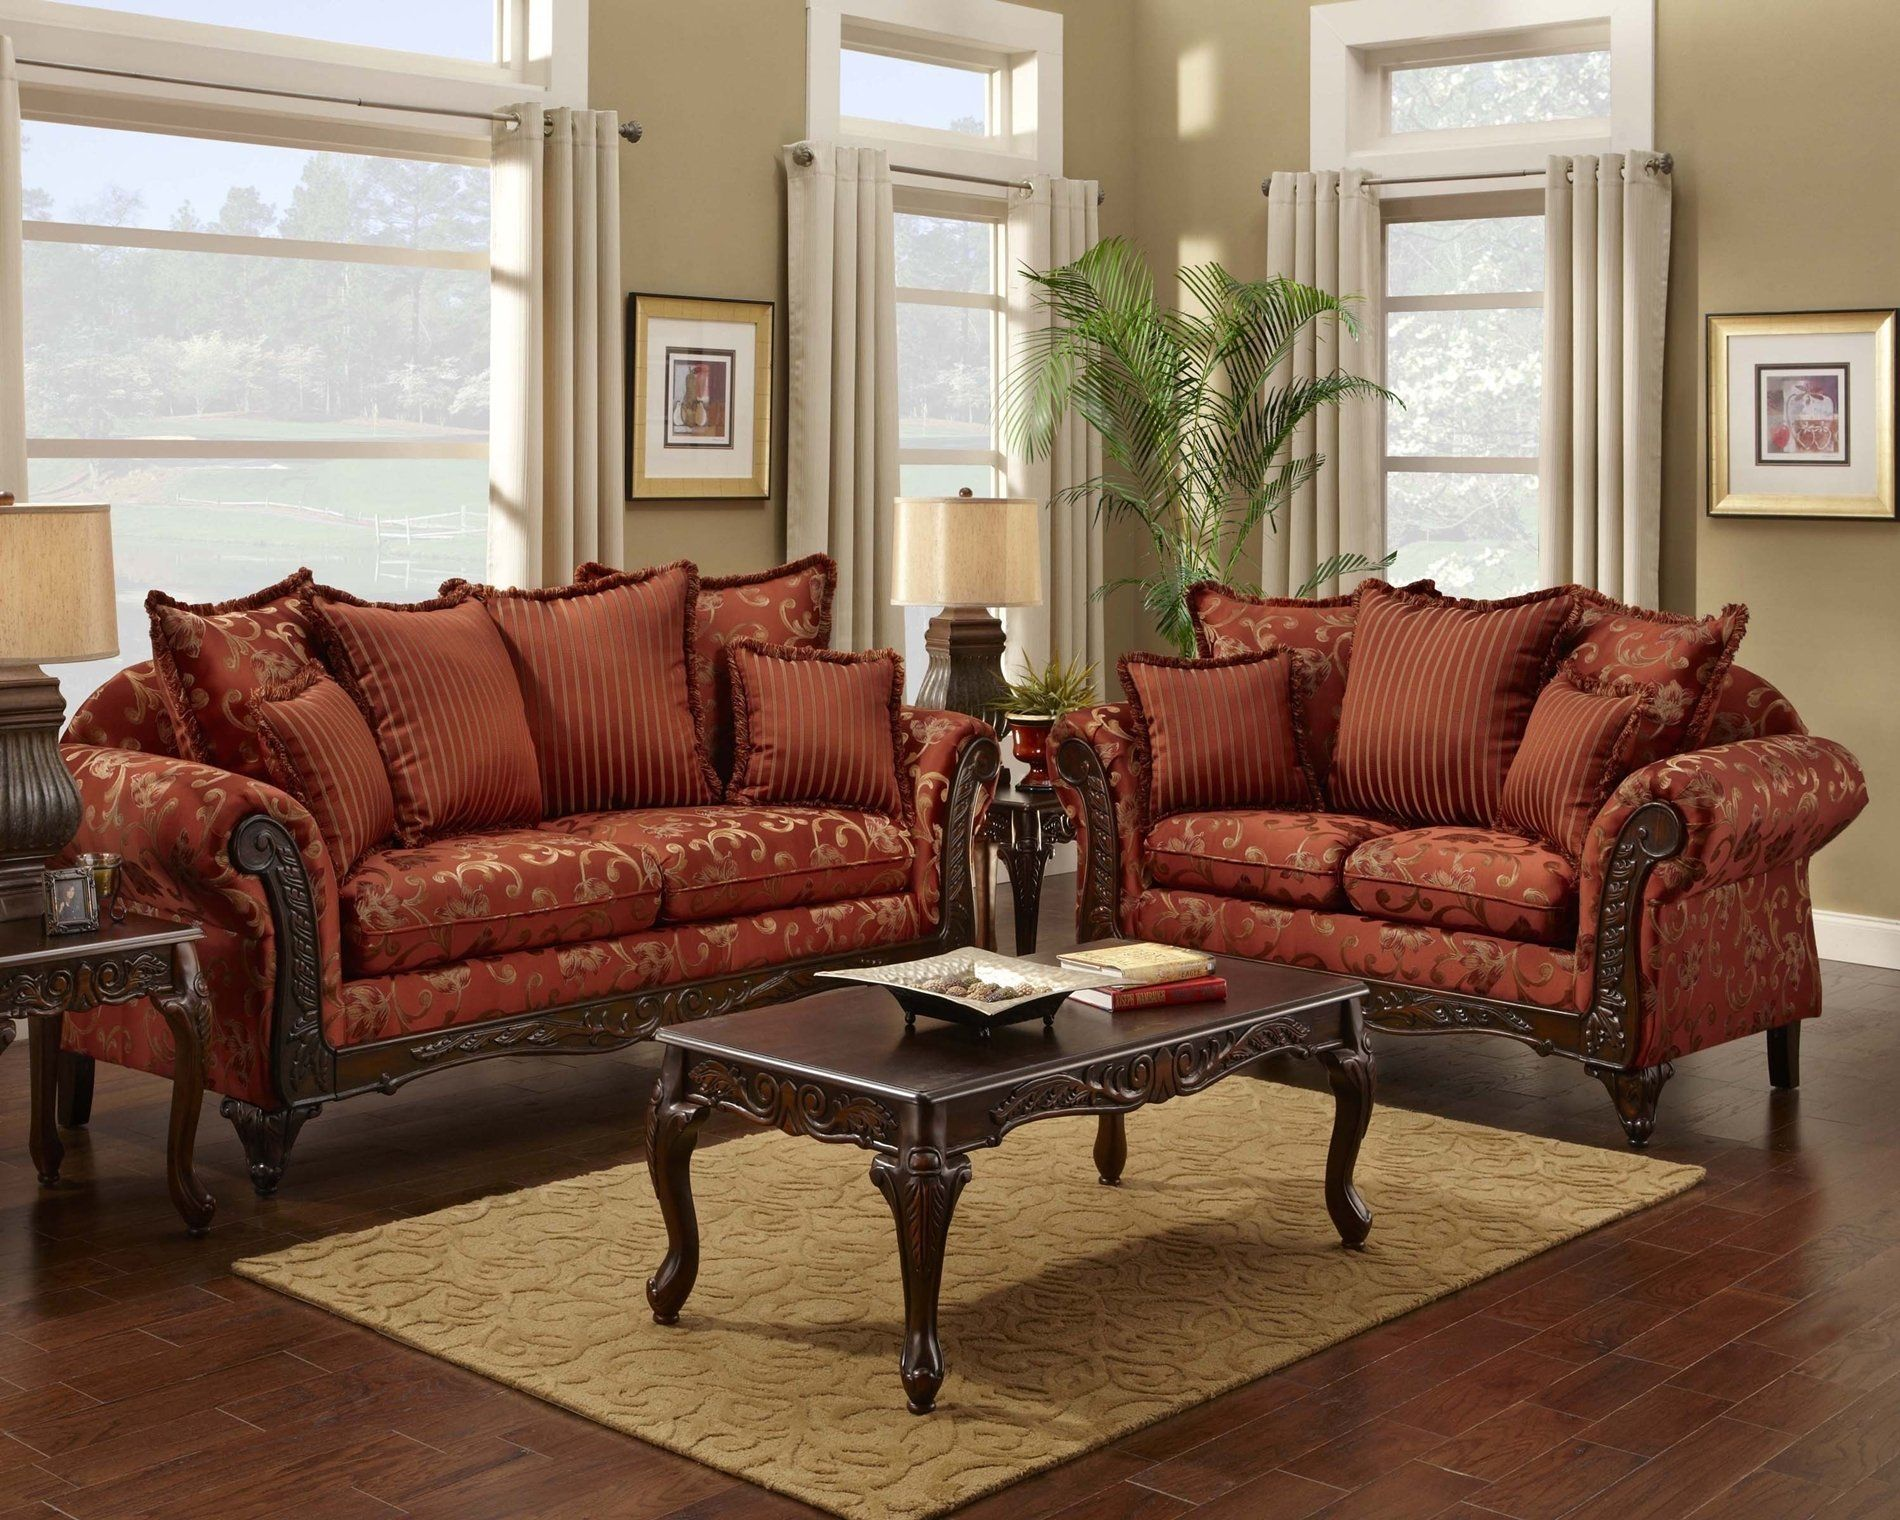 print sofa set grey corner metal legs red floral and loveseat traditional